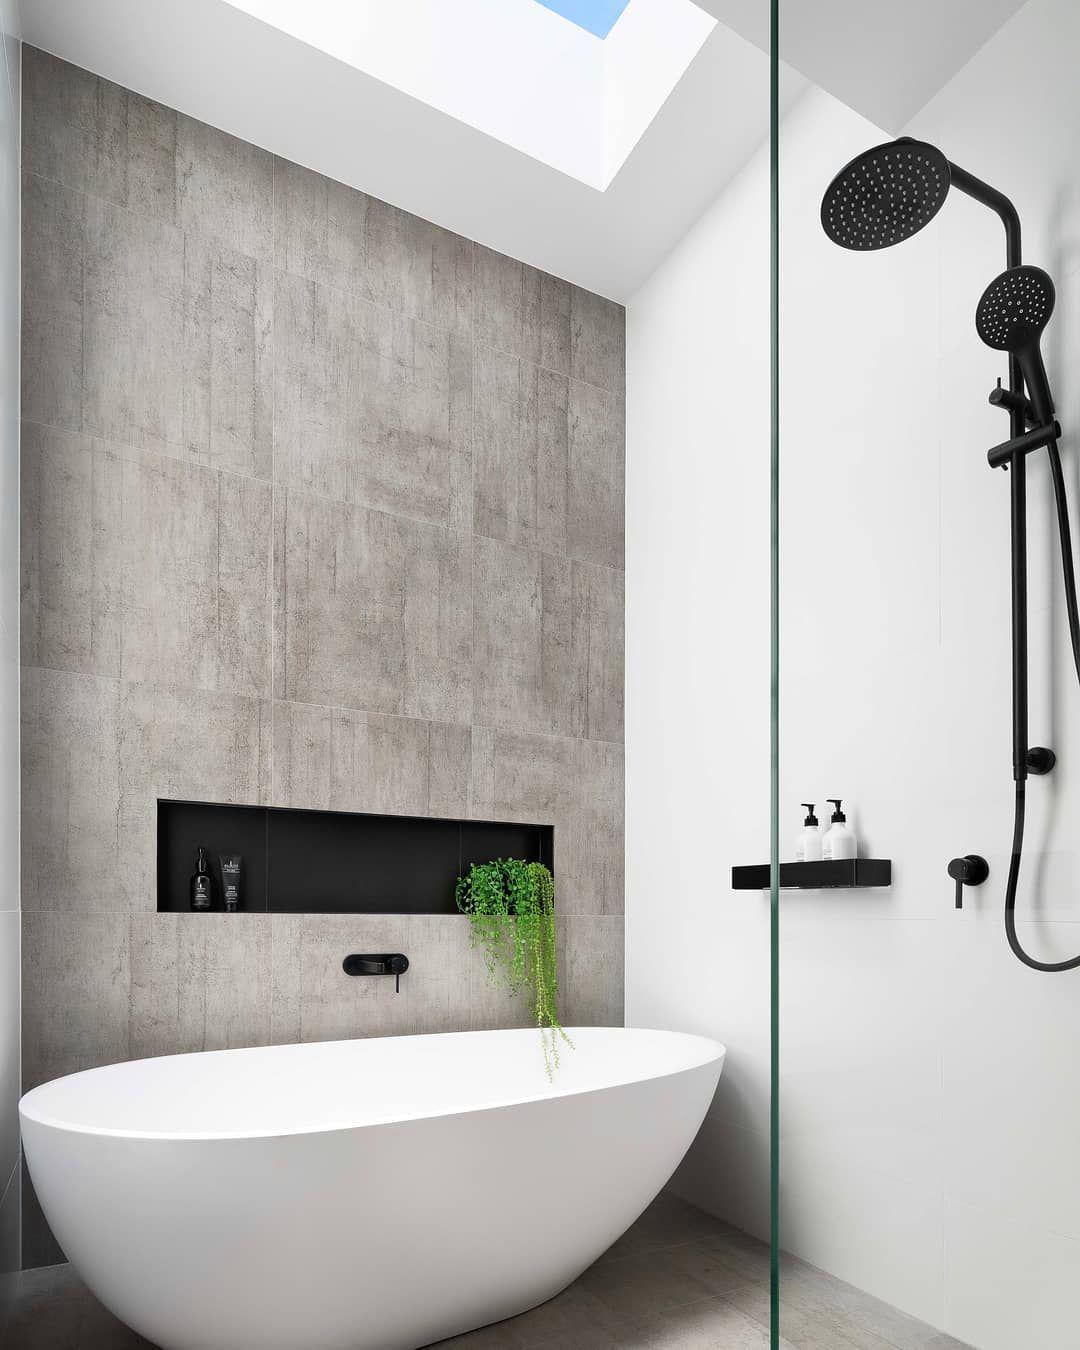 Gia Bathrooms Kitchens On Instagram Natural Lighting For Our Malverneastproject Bathroom Creat Open Plan Bathrooms Easy Bathroom Decorating Reece Bathroom